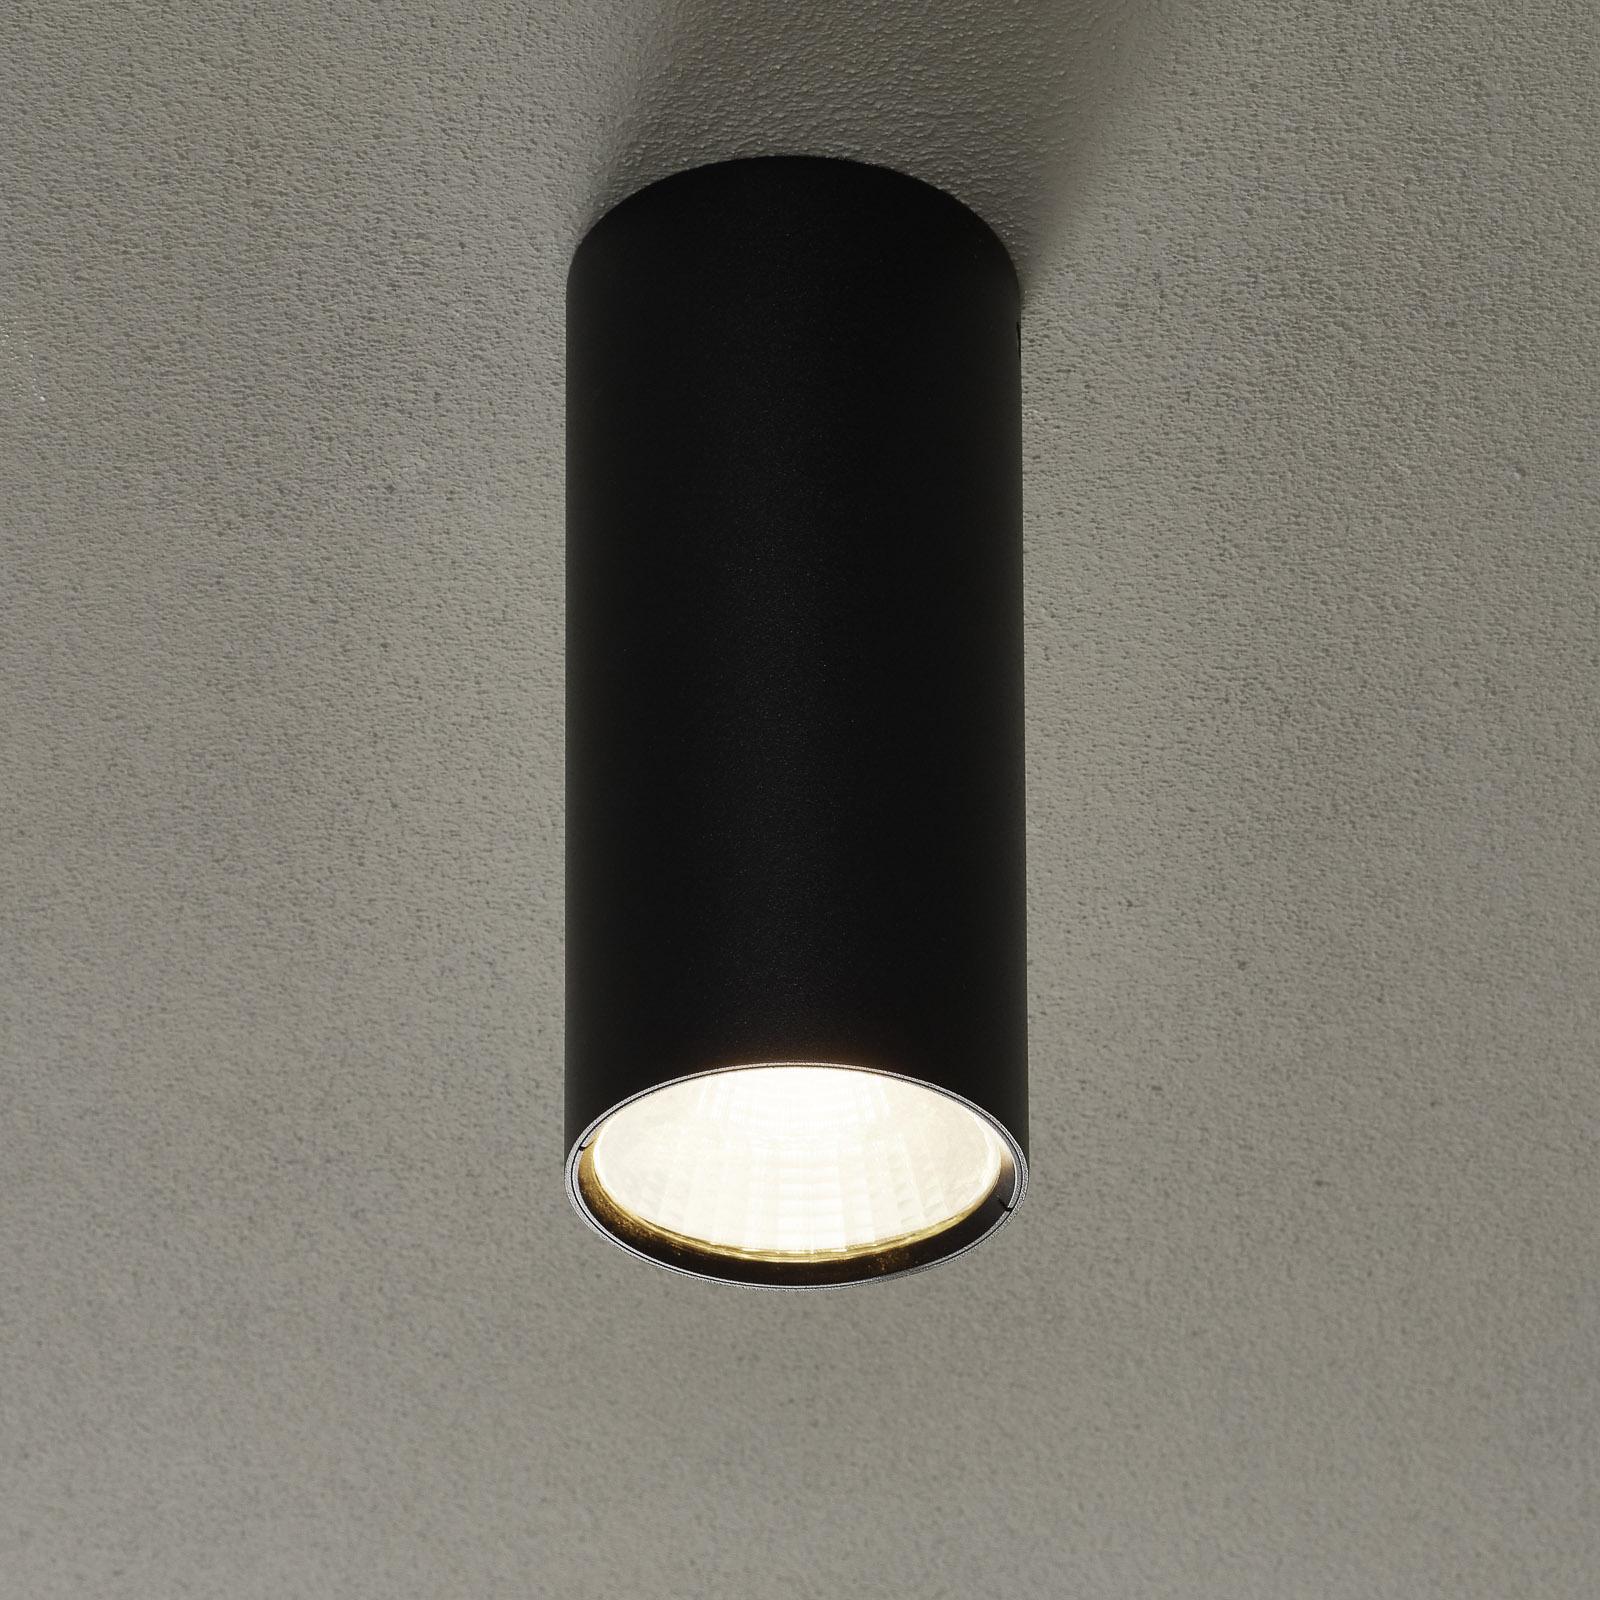 Lucande Takio LED-downlight 2700K Ø10cm svart